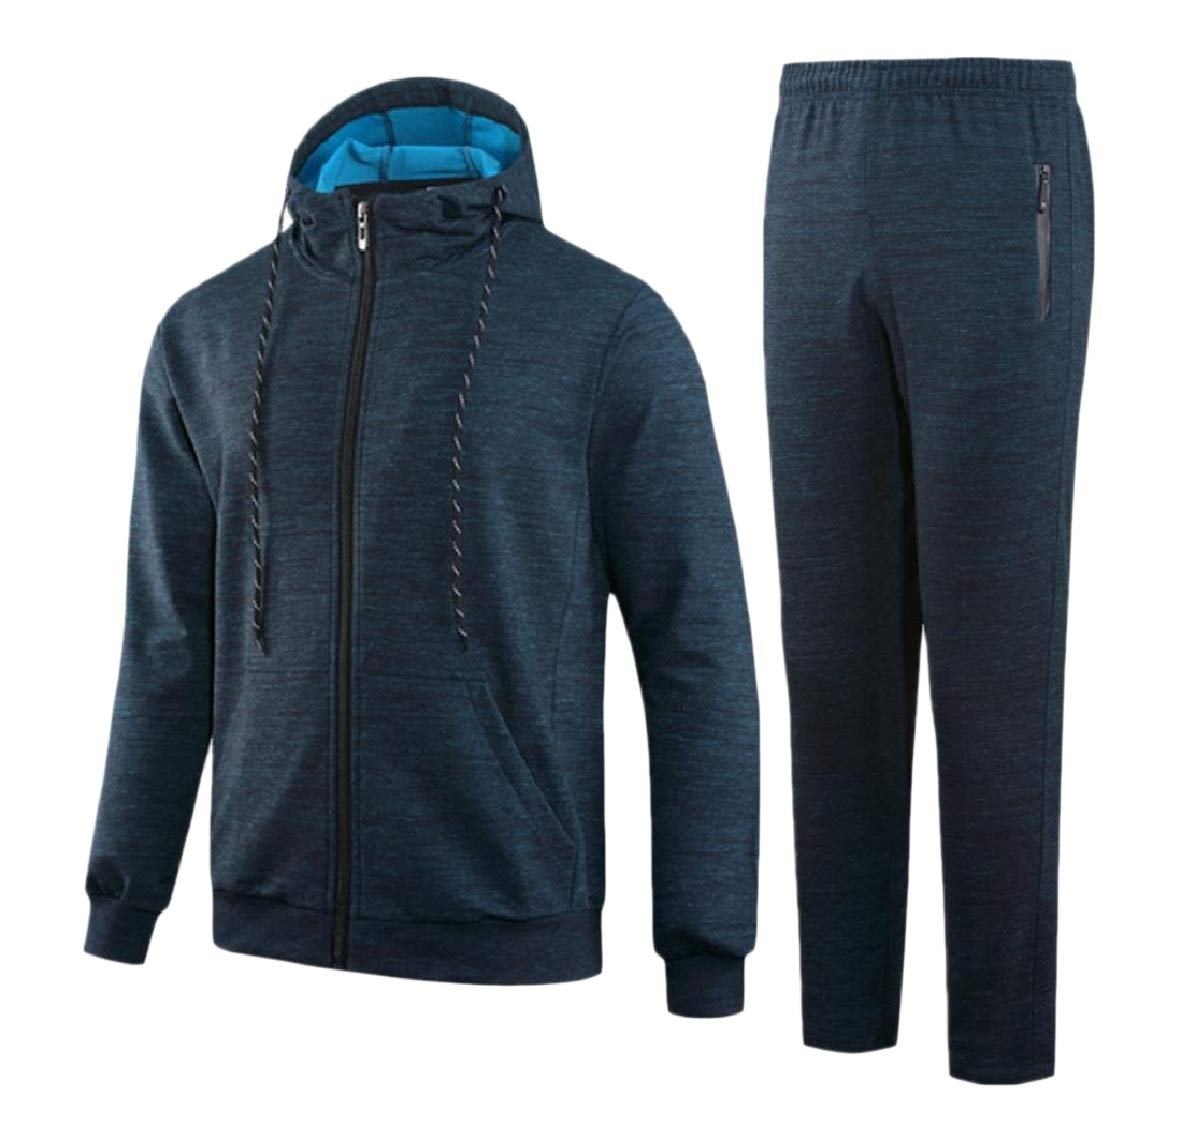 4db5f2b6277 blueee Tryist Men's Loose Full-Zip Hoode Sweatshirt Parka Parka Parka  Jackets Sweatsuit Set blueee M c90af5